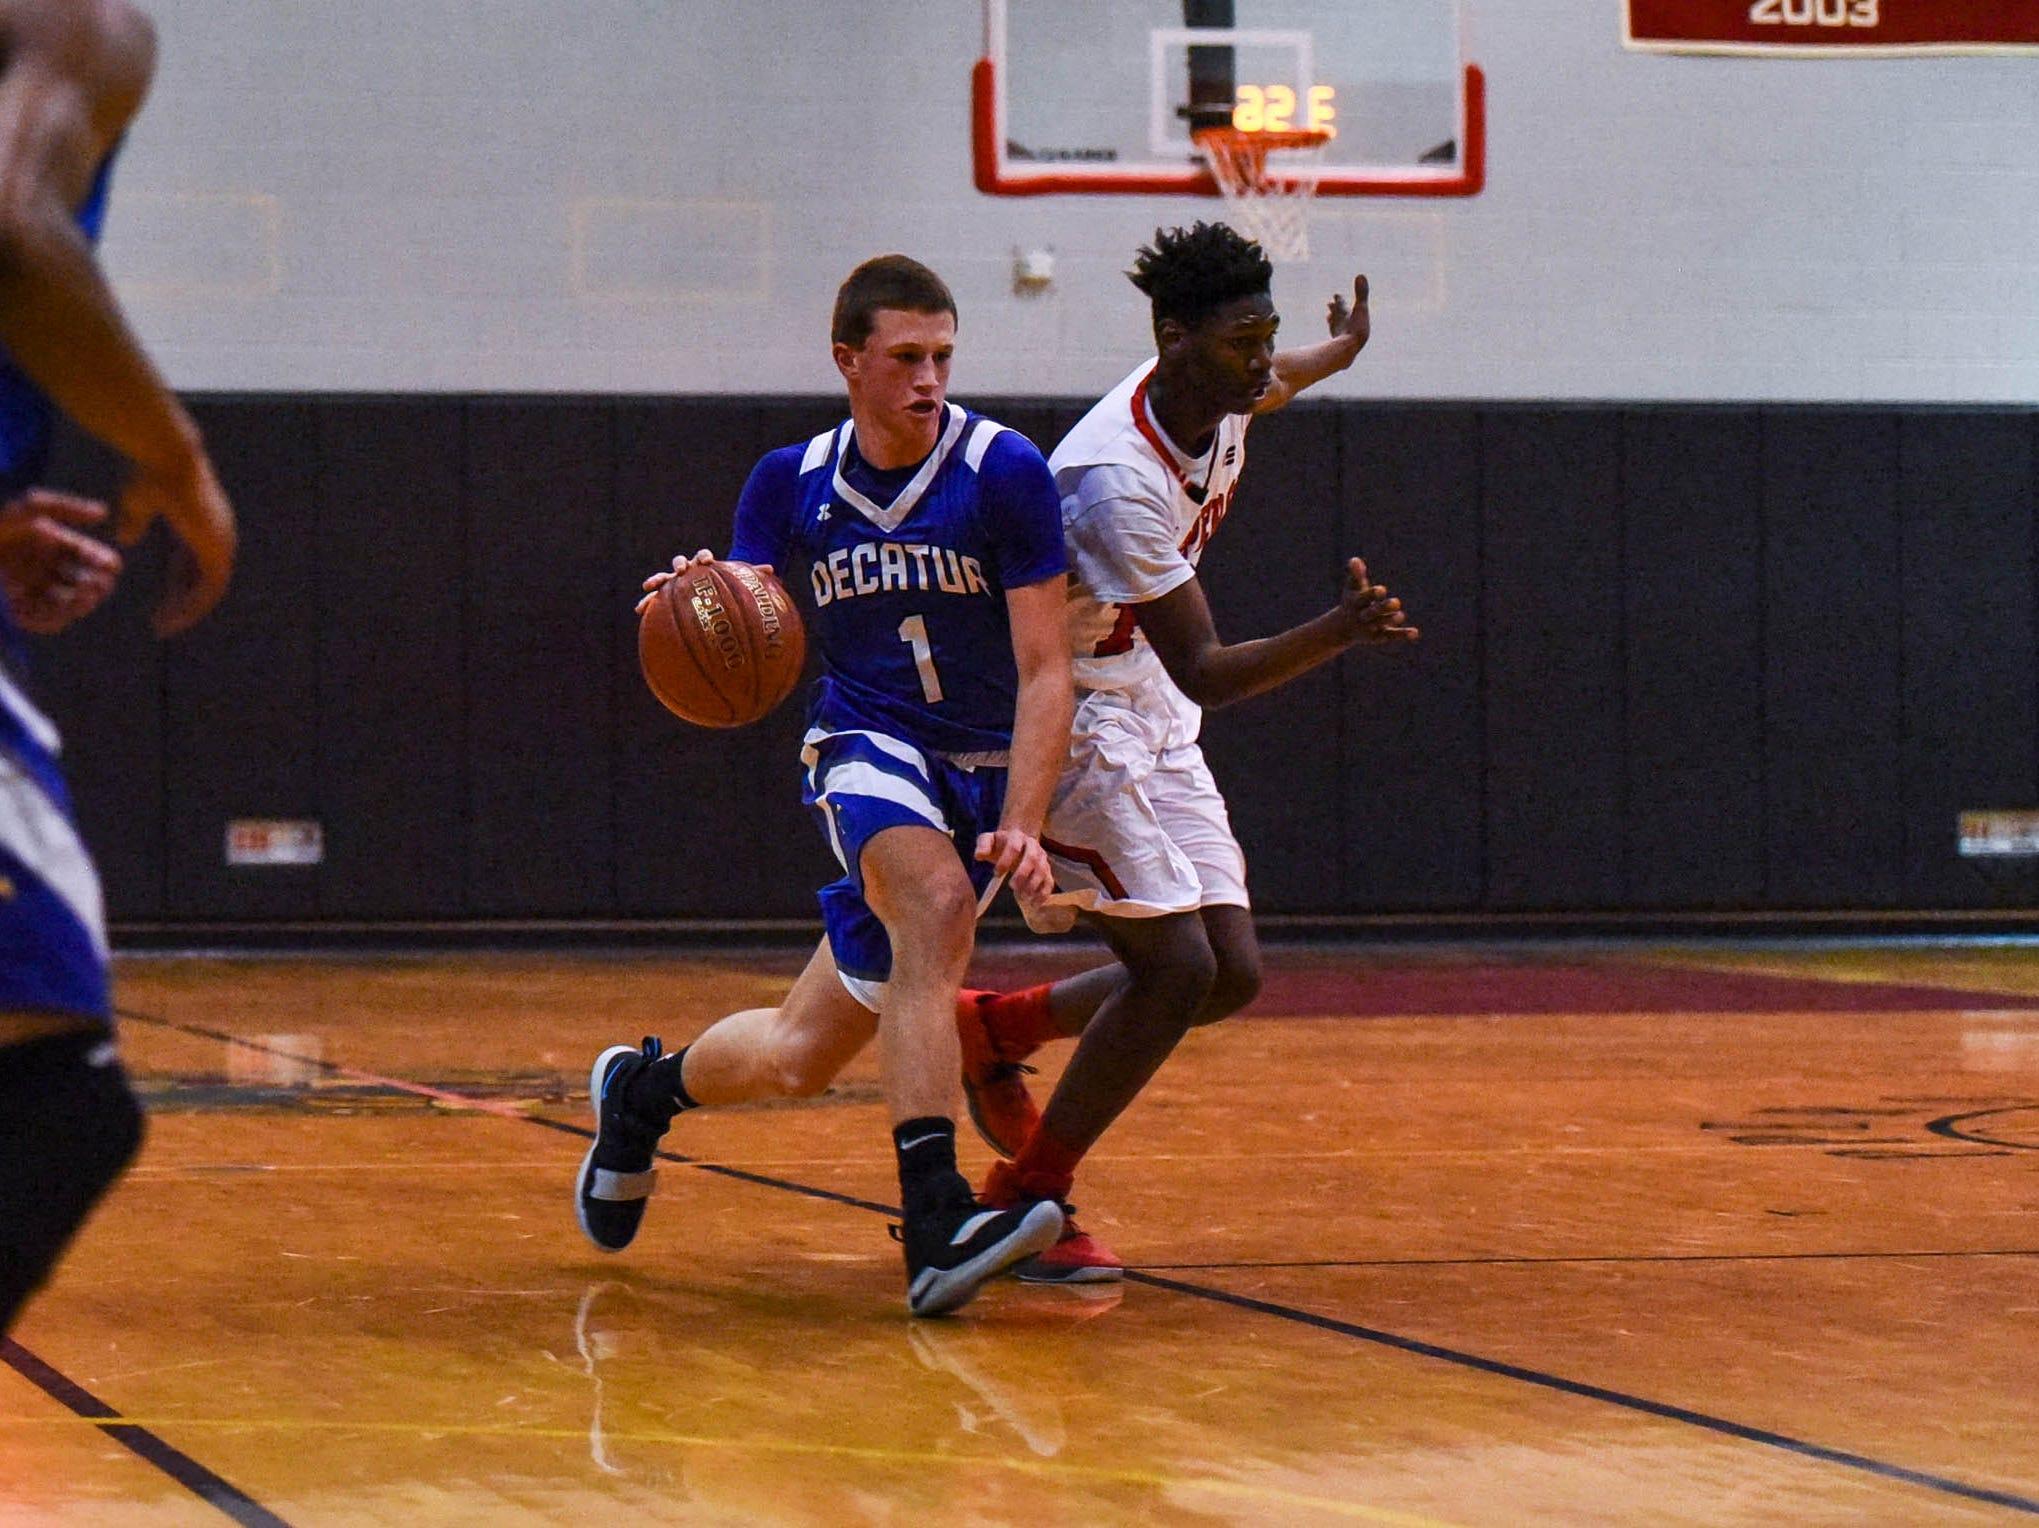 Decatur's Drew Haueisen (1) moves the ball during a game against Bennett at Bennett High School in Salisbury on Thursday, Jan 3, 2018.